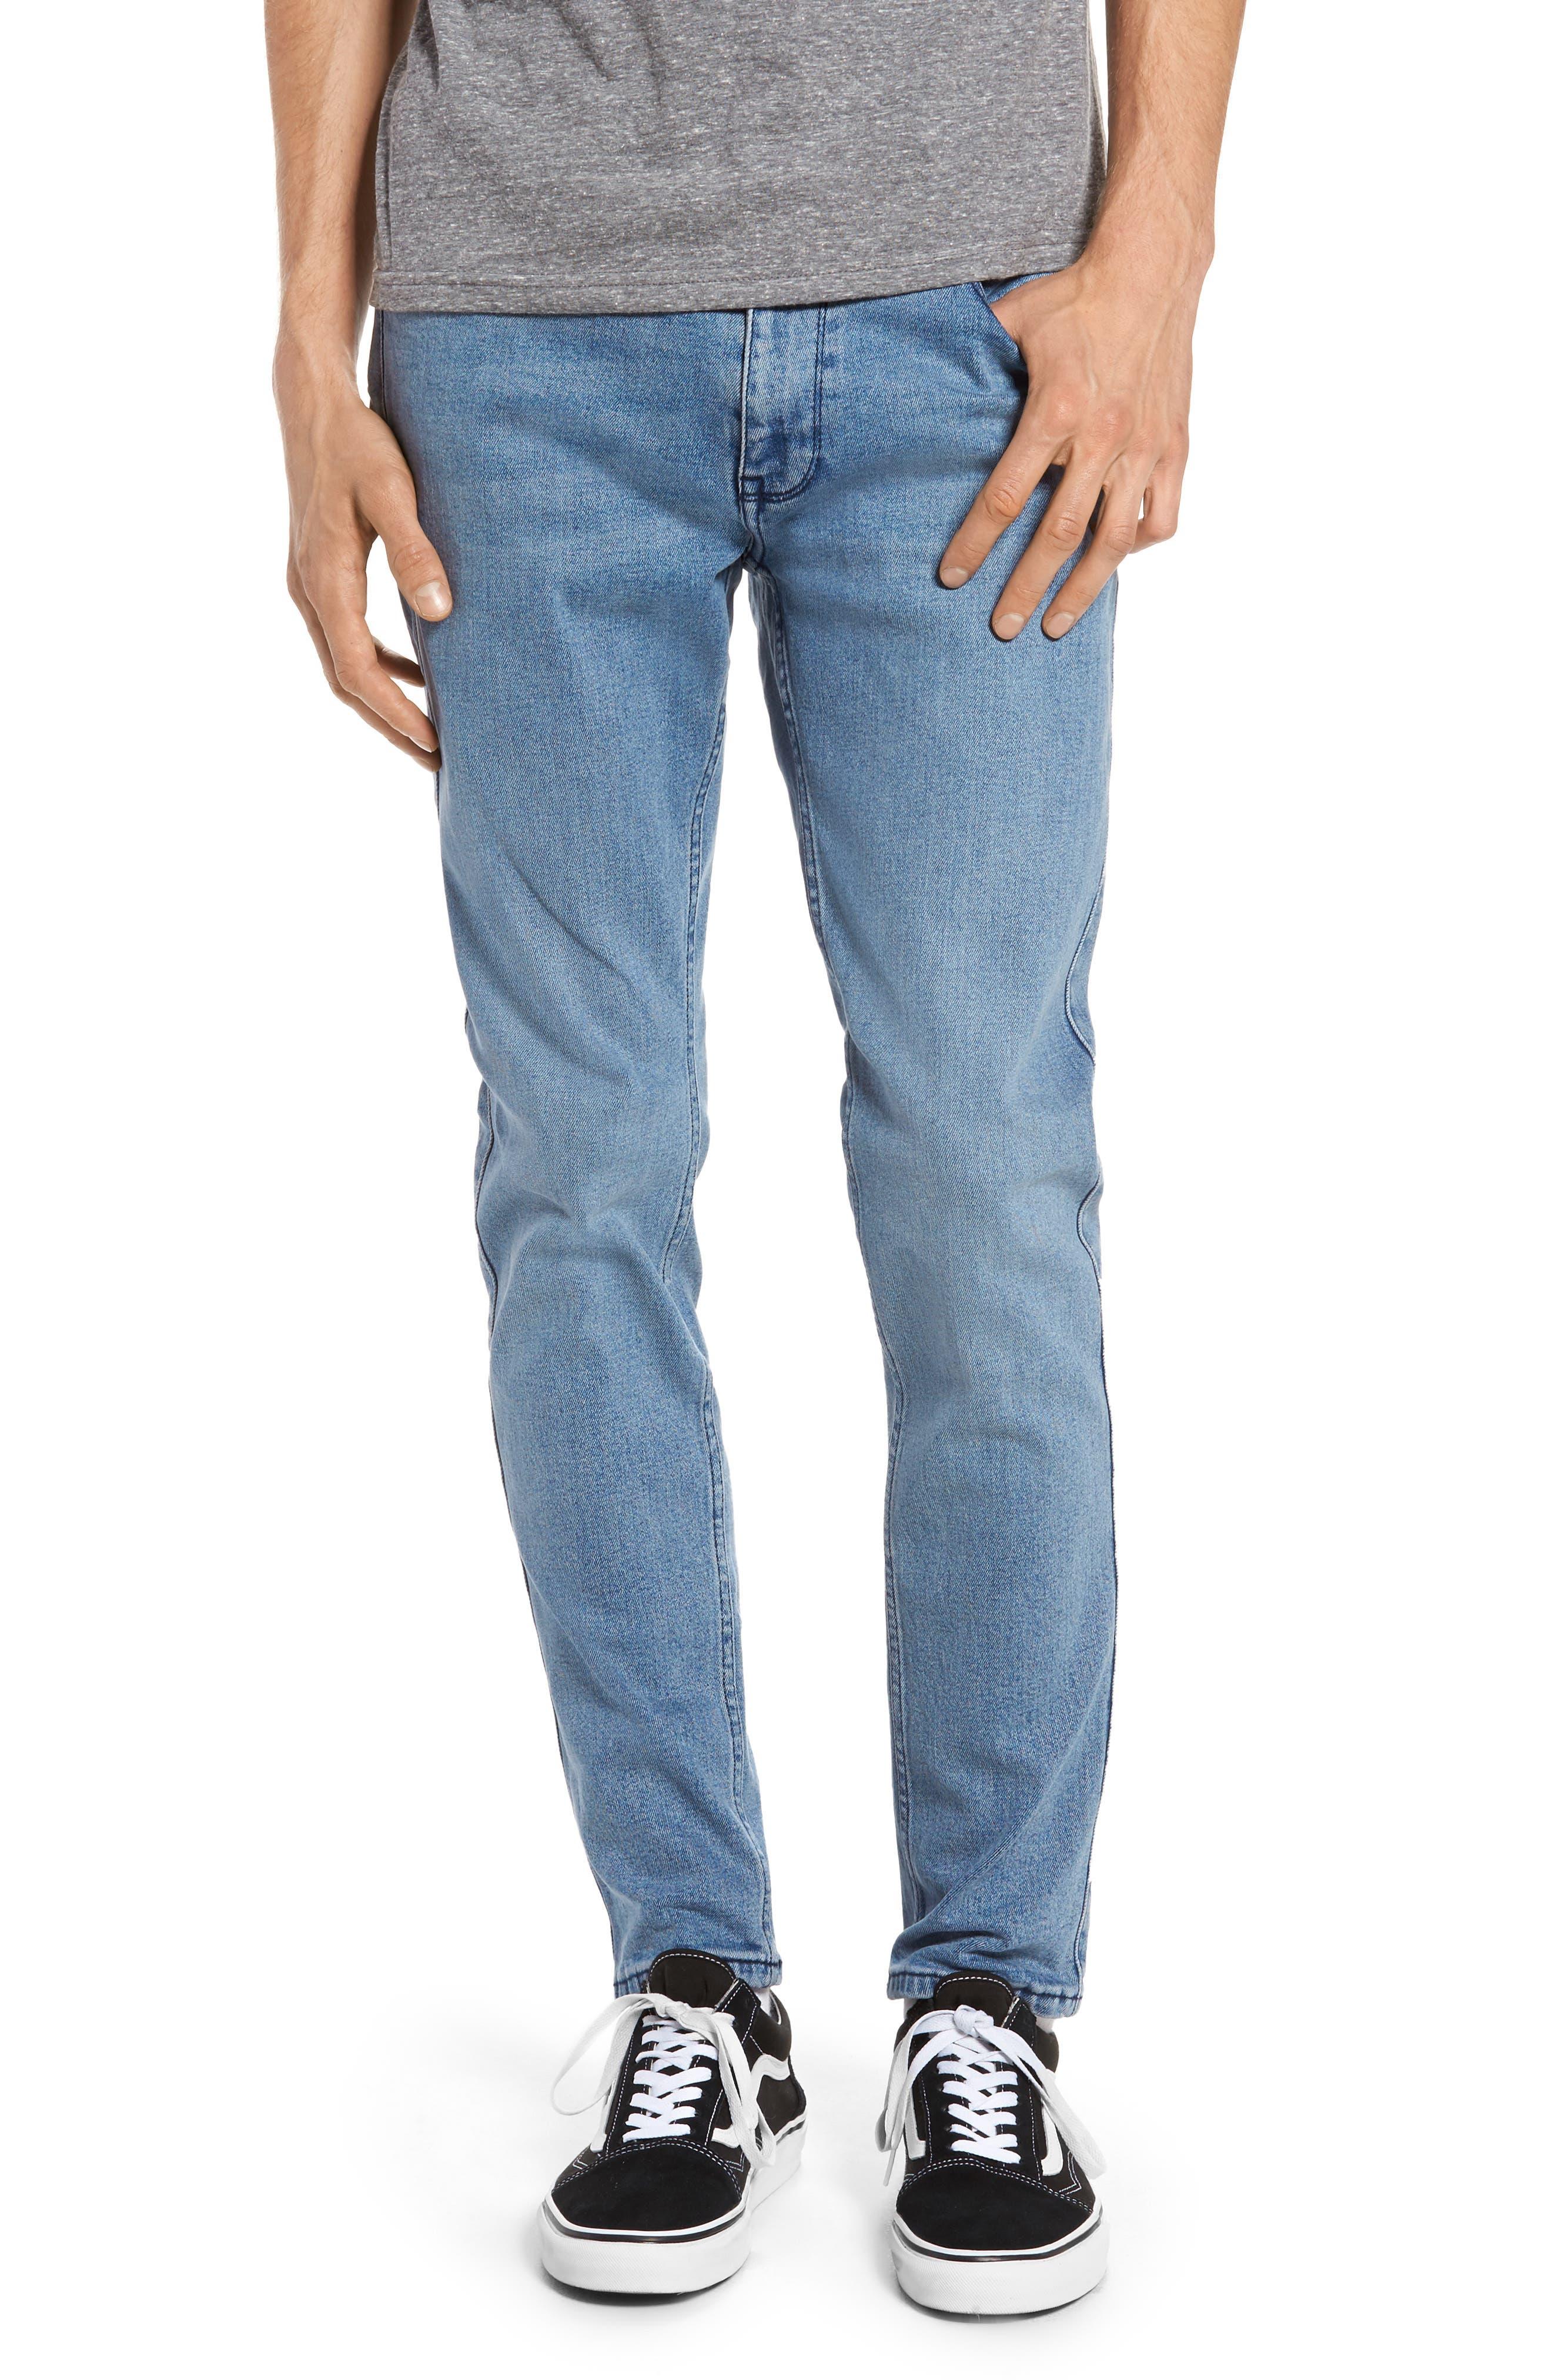 Clark Slim Straight Leg Jeans,                             Main thumbnail 1, color,                             402